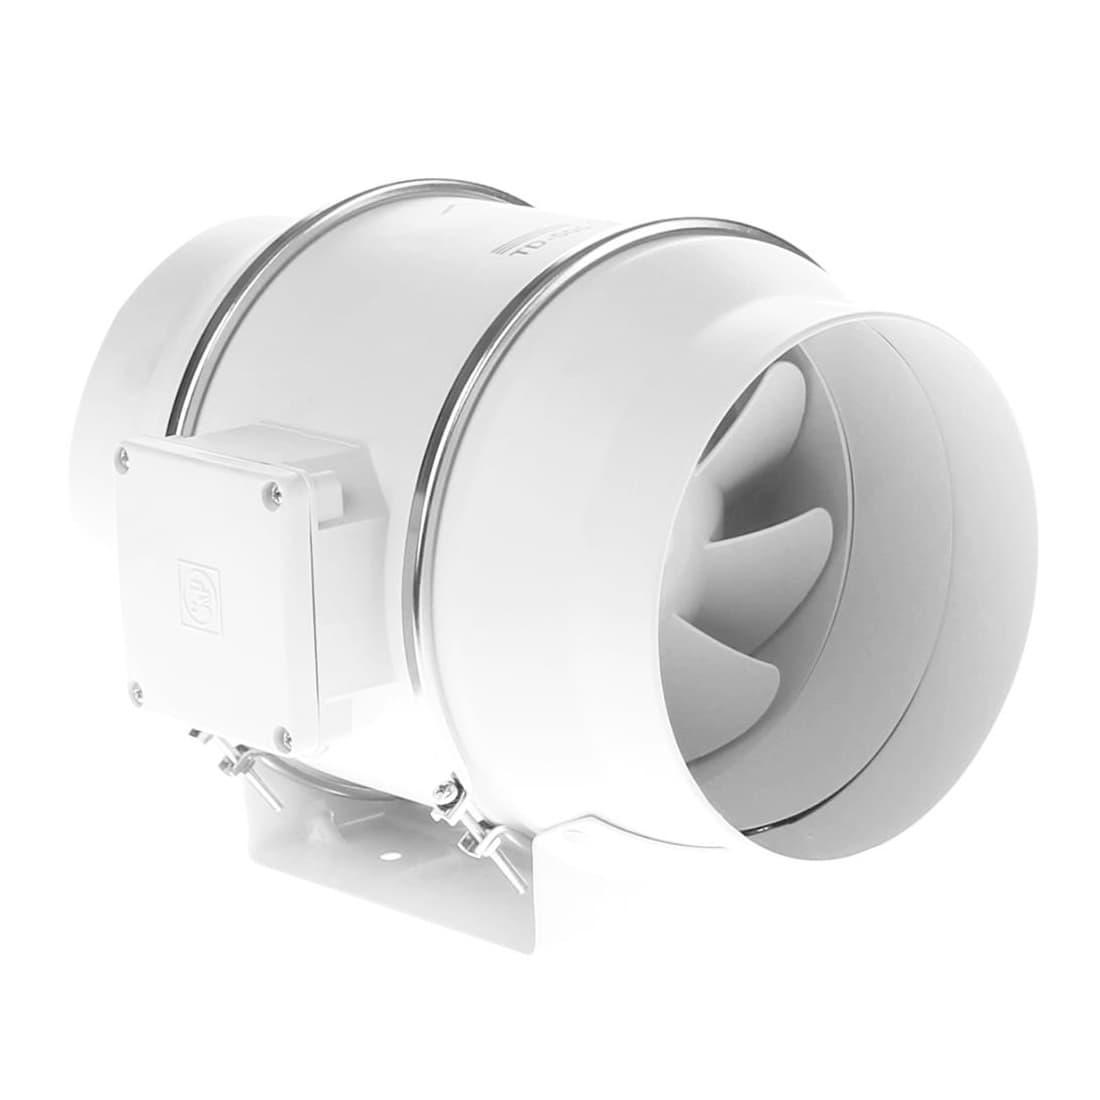 Канальный вентилятор Soler&Palau TD-500/150-160 Silent T 3V